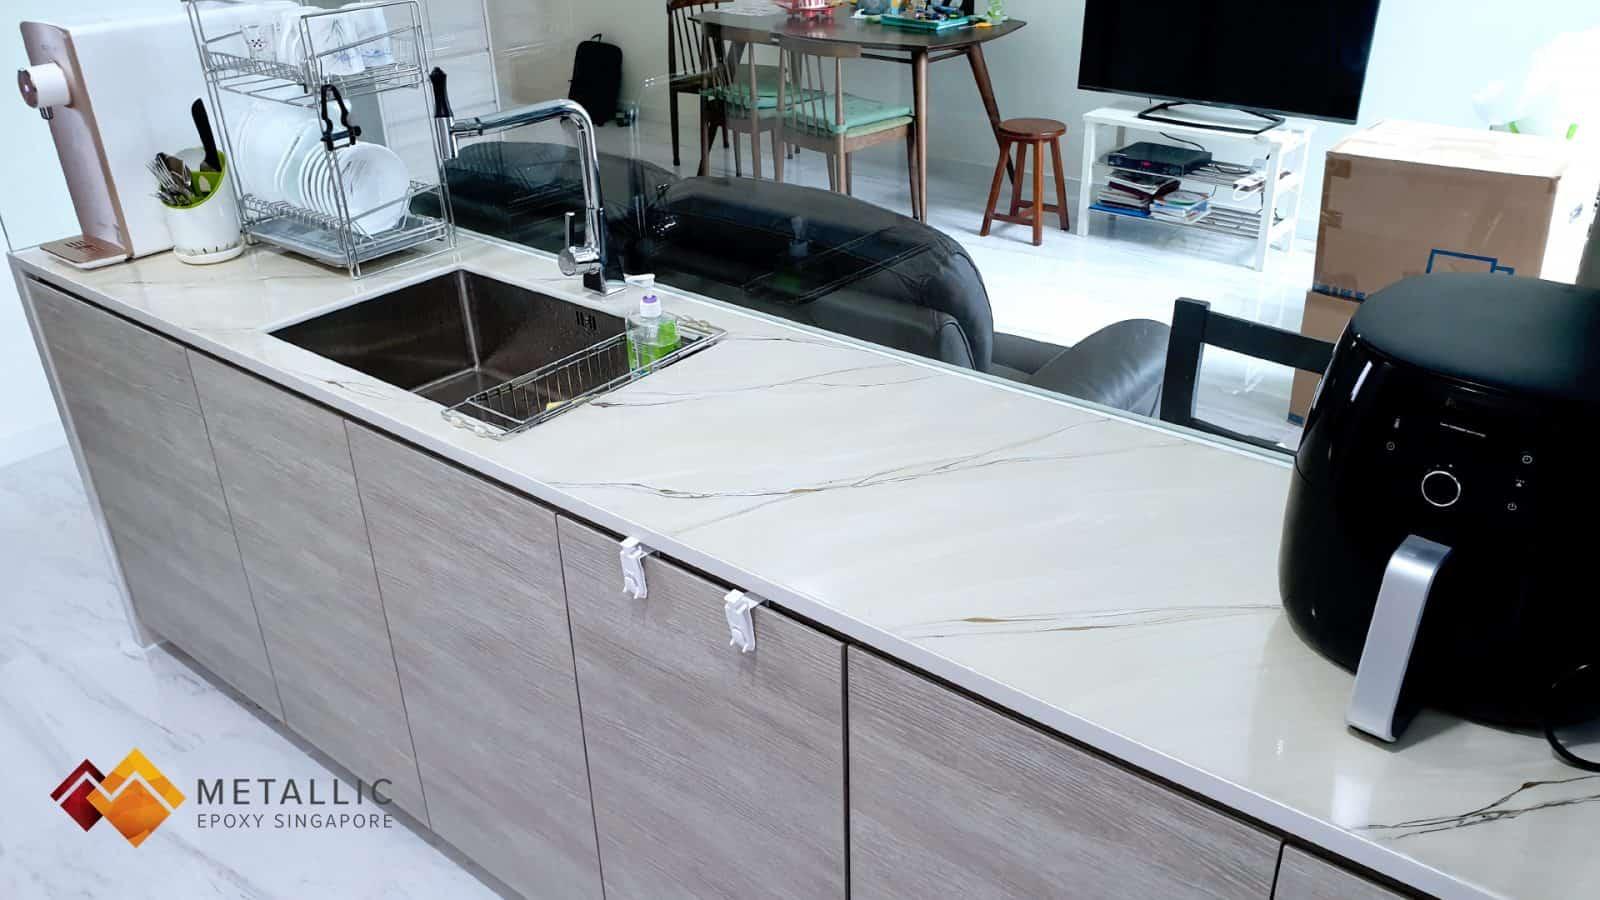 Light Khaki Marble Countertop